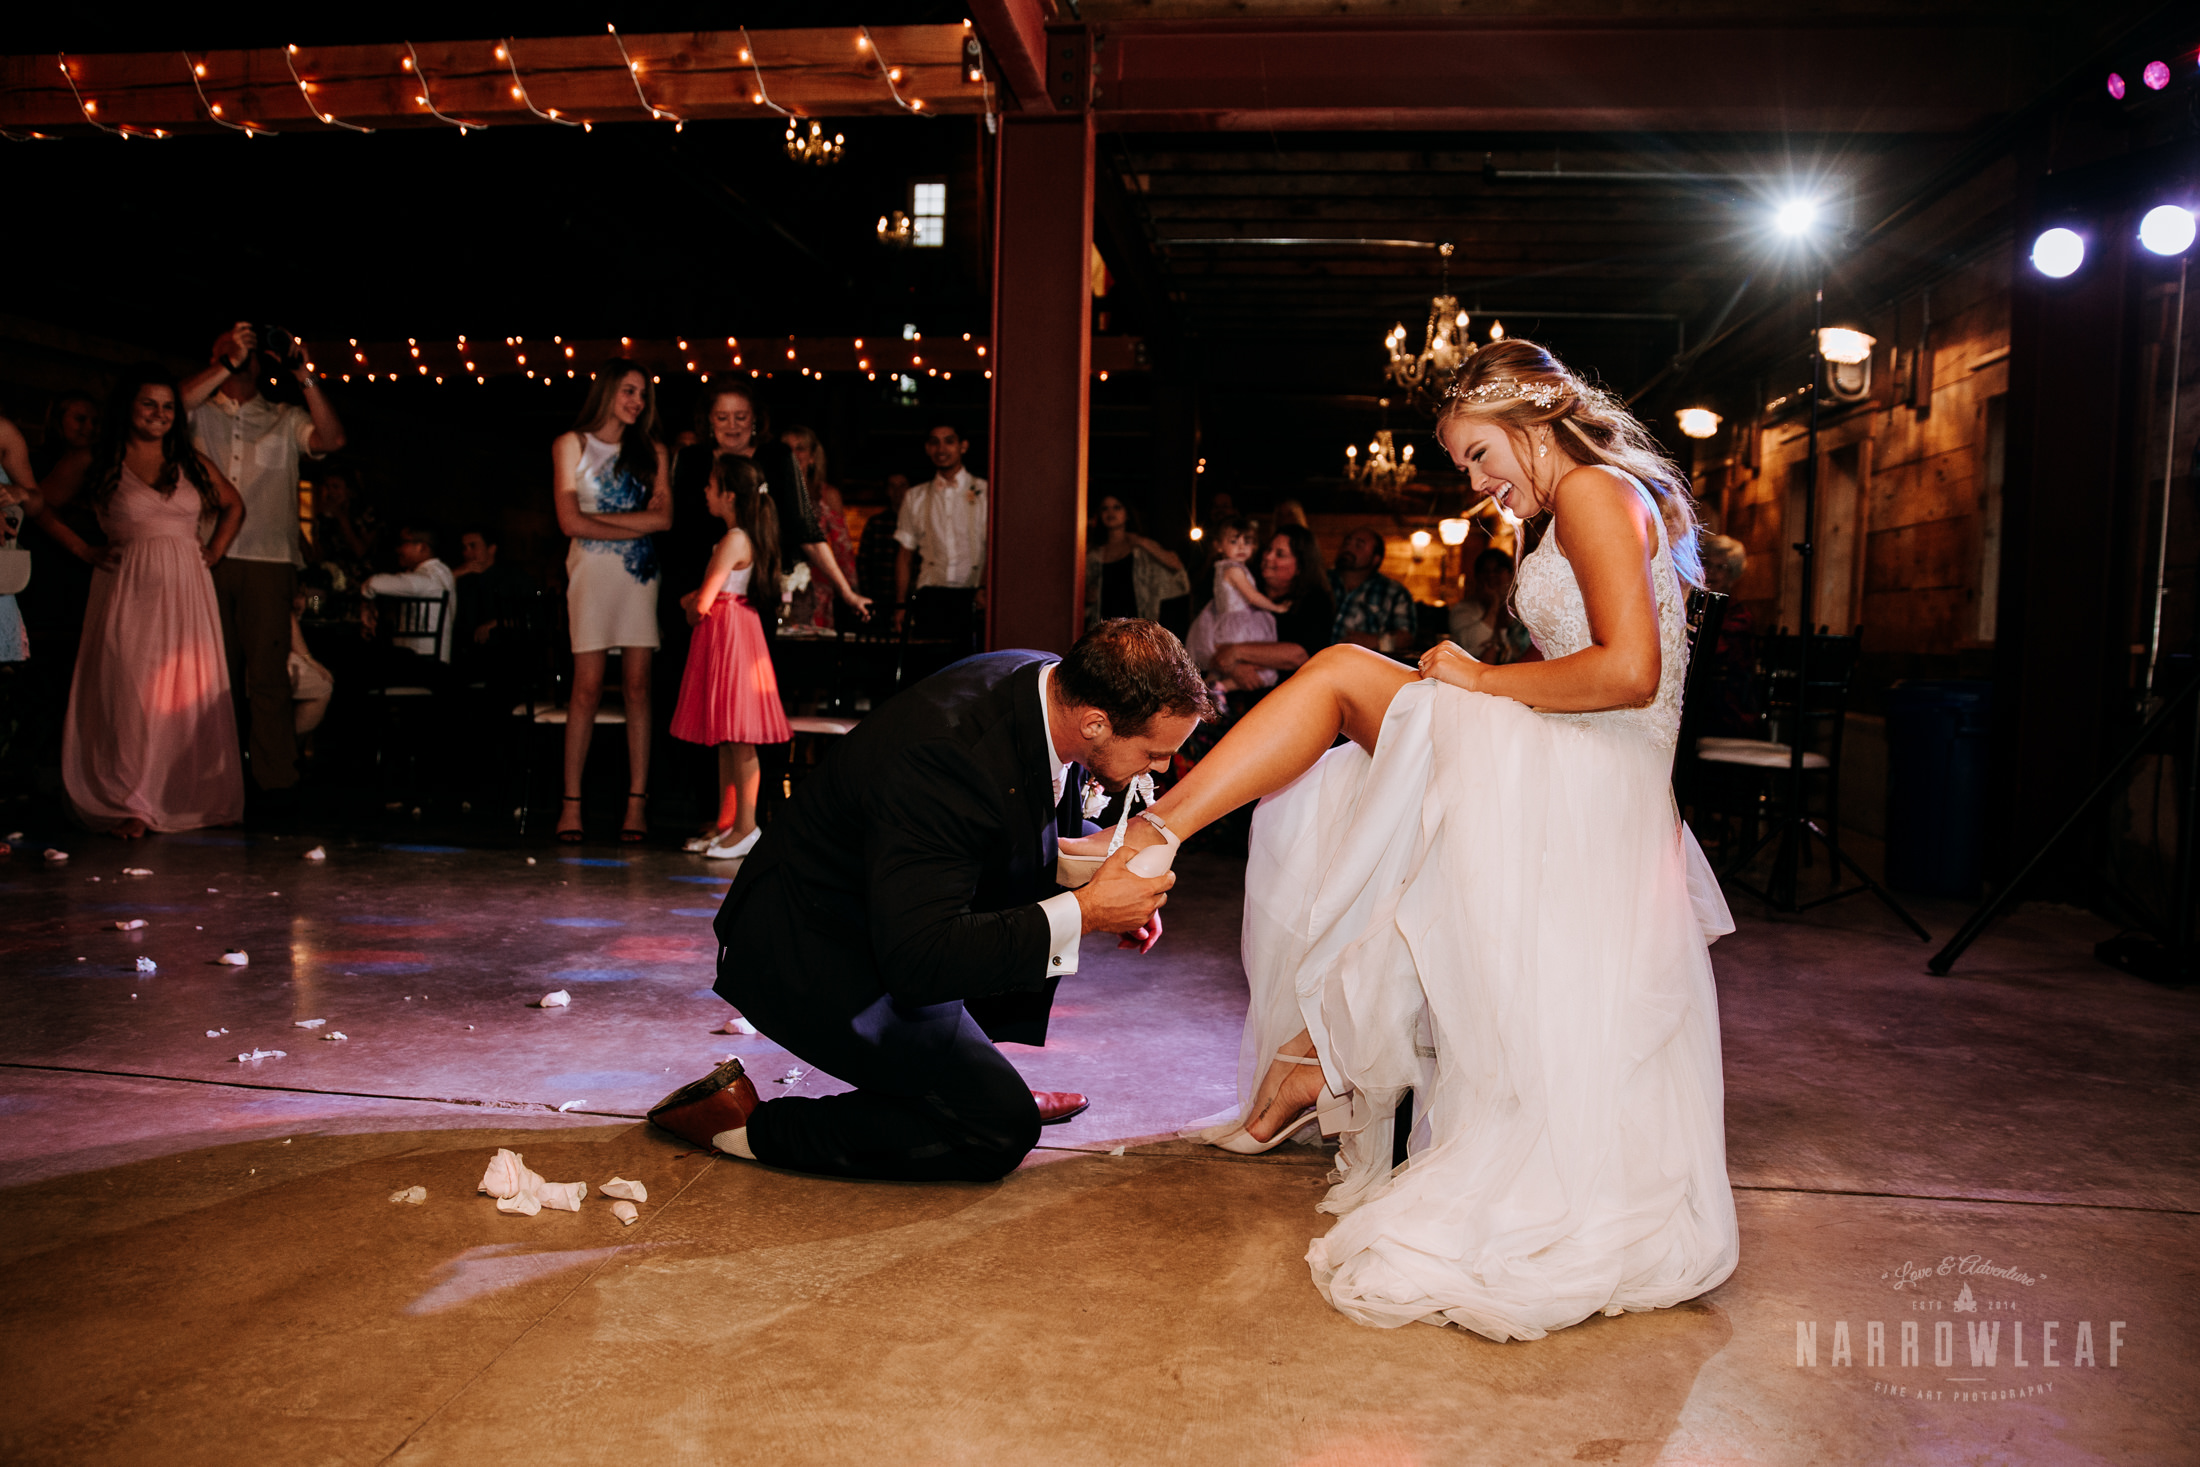 John-P-Furber-Farm-Minnesota-wedding-photographer-Narrowleaf_Love_and_Adventure_Photography-0028.jpg